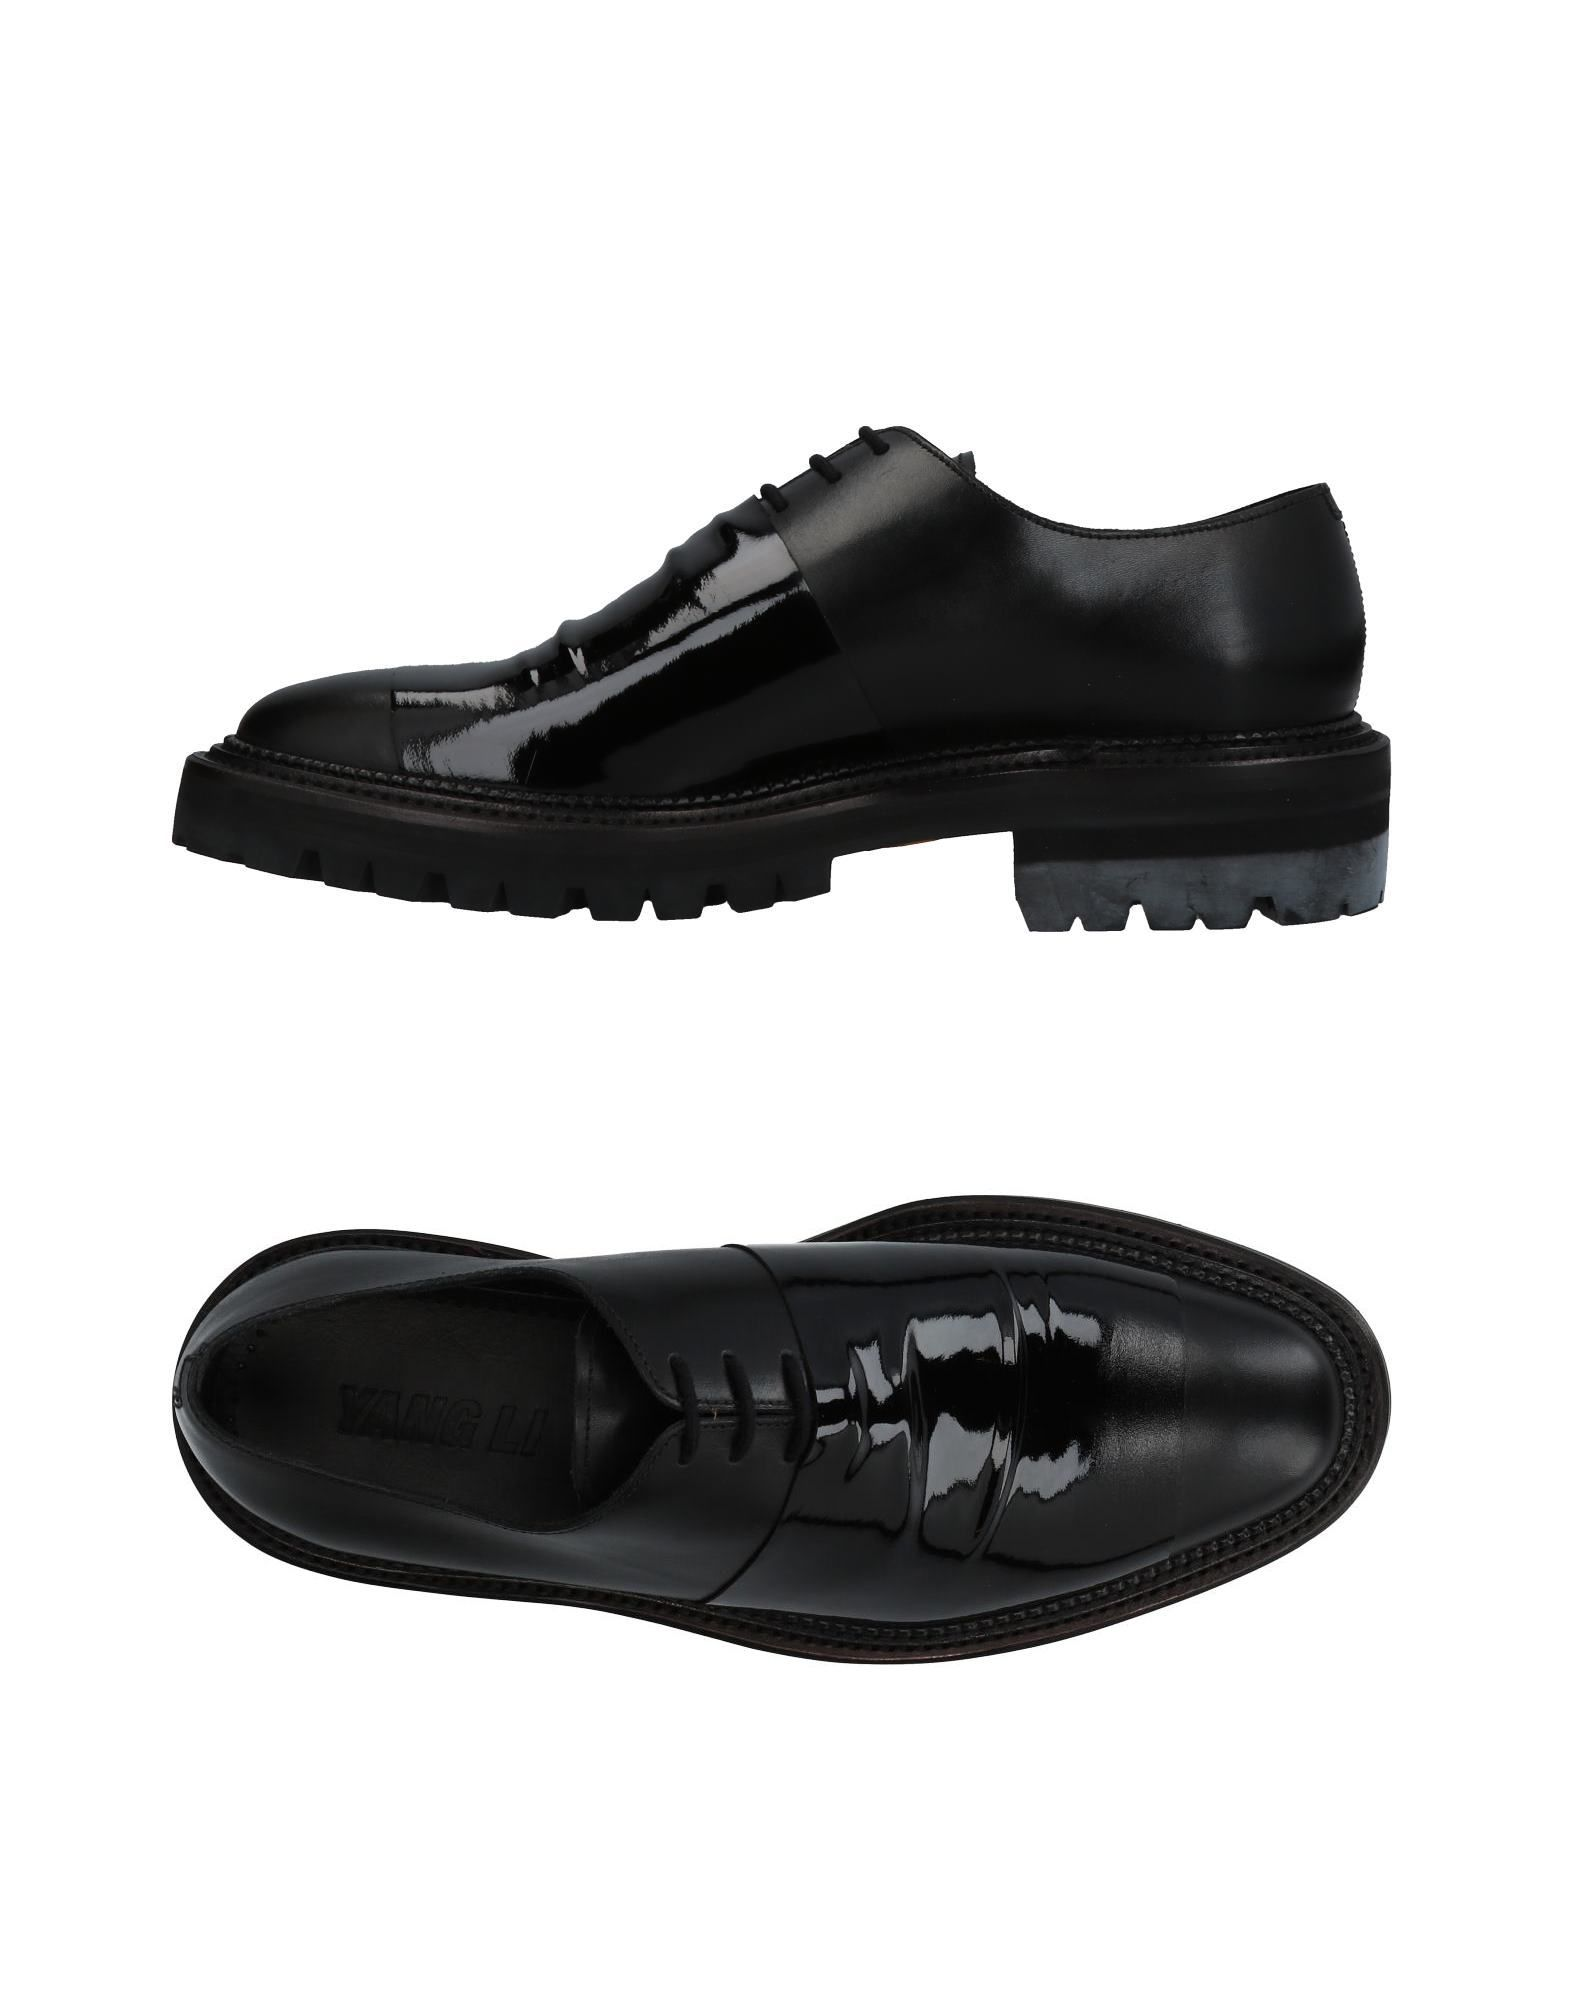 Yang Li Schnürschuhe Herren  11437135JA Gute Qualität beliebte Schuhe